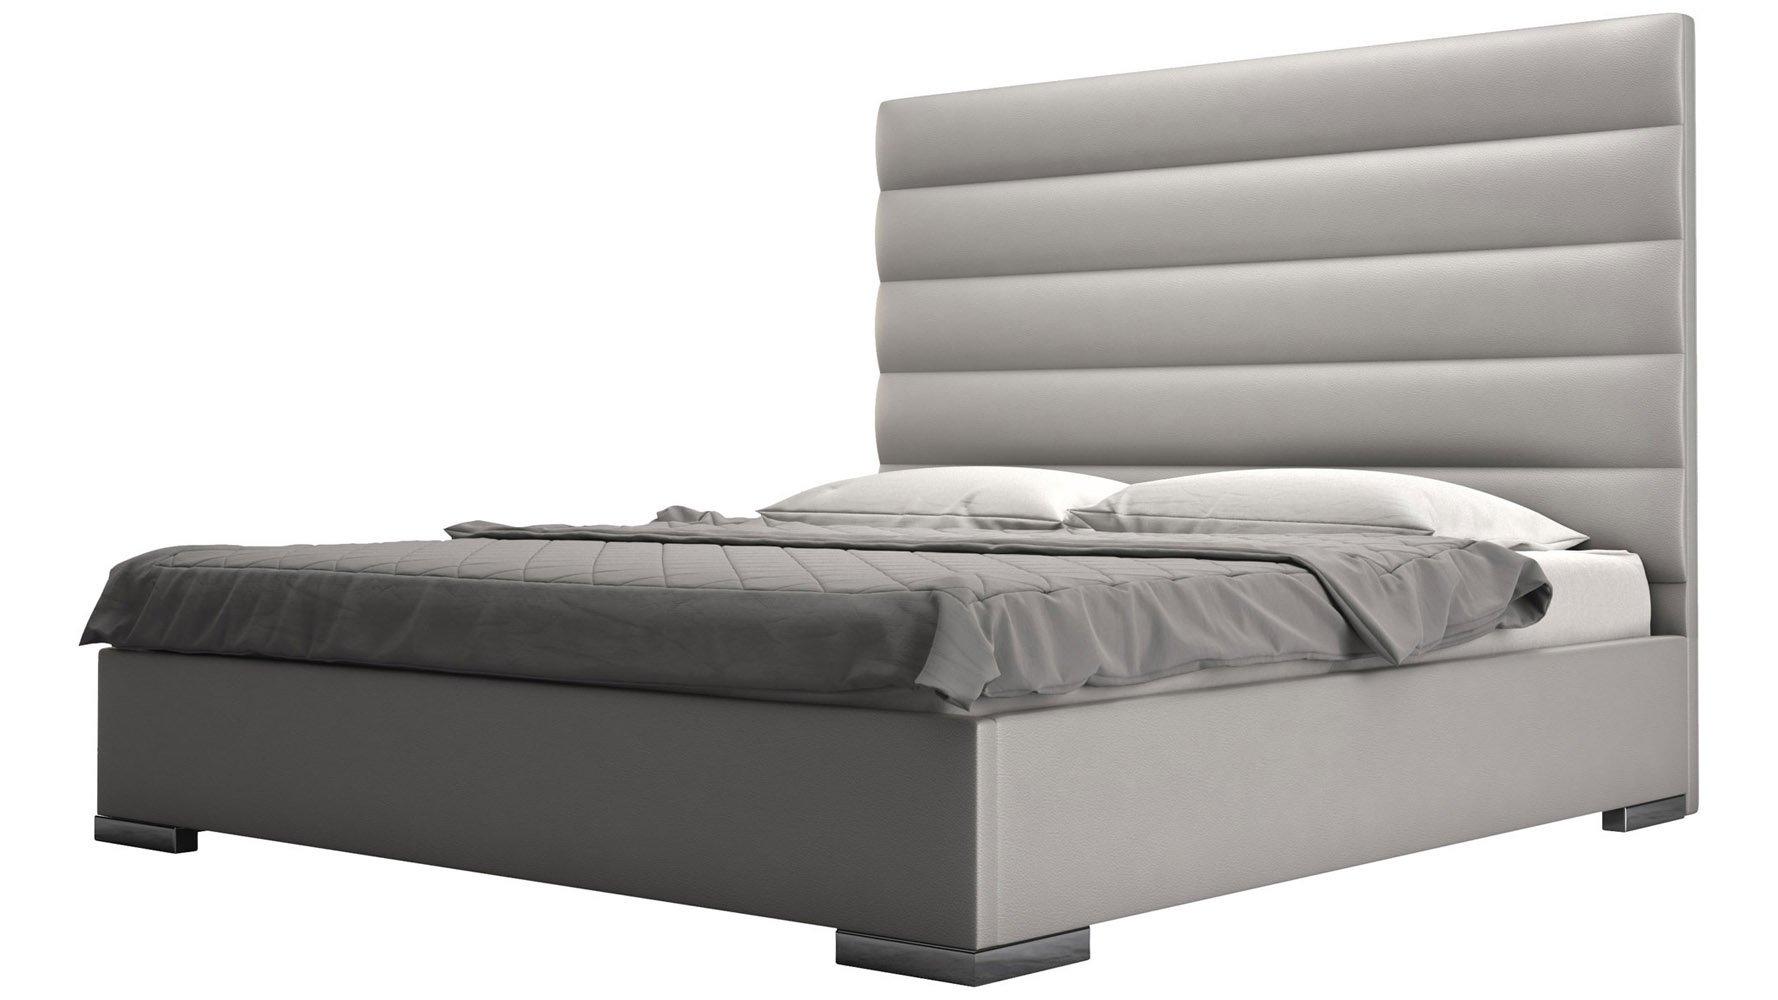 Modern Bedroom Furniture U0026 Accents   Contemporary Bedroom | Zuri Furniture